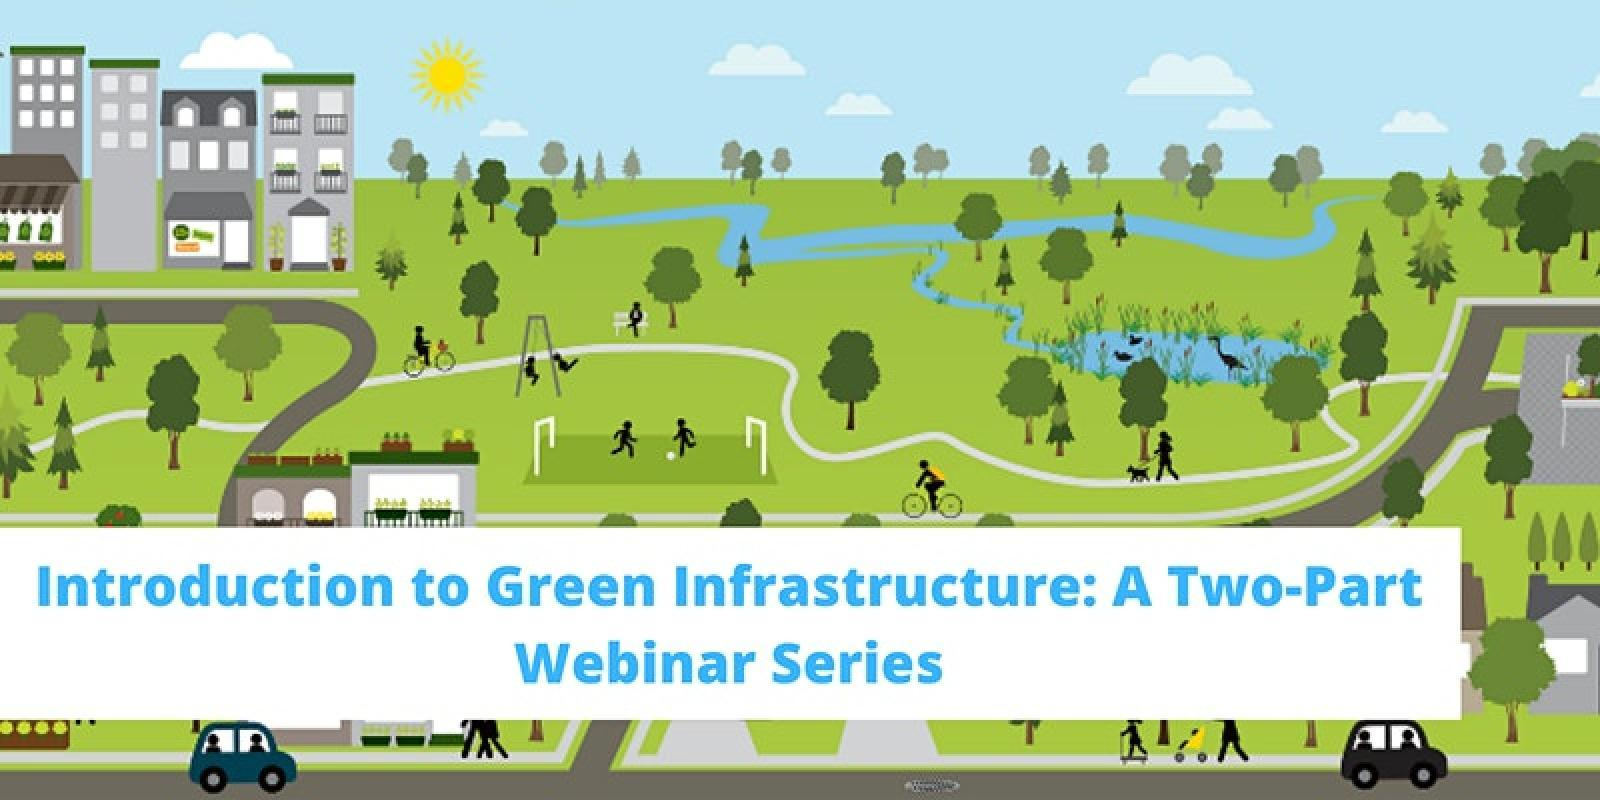 Green Infrastructure: A Two-Part Webinar Series